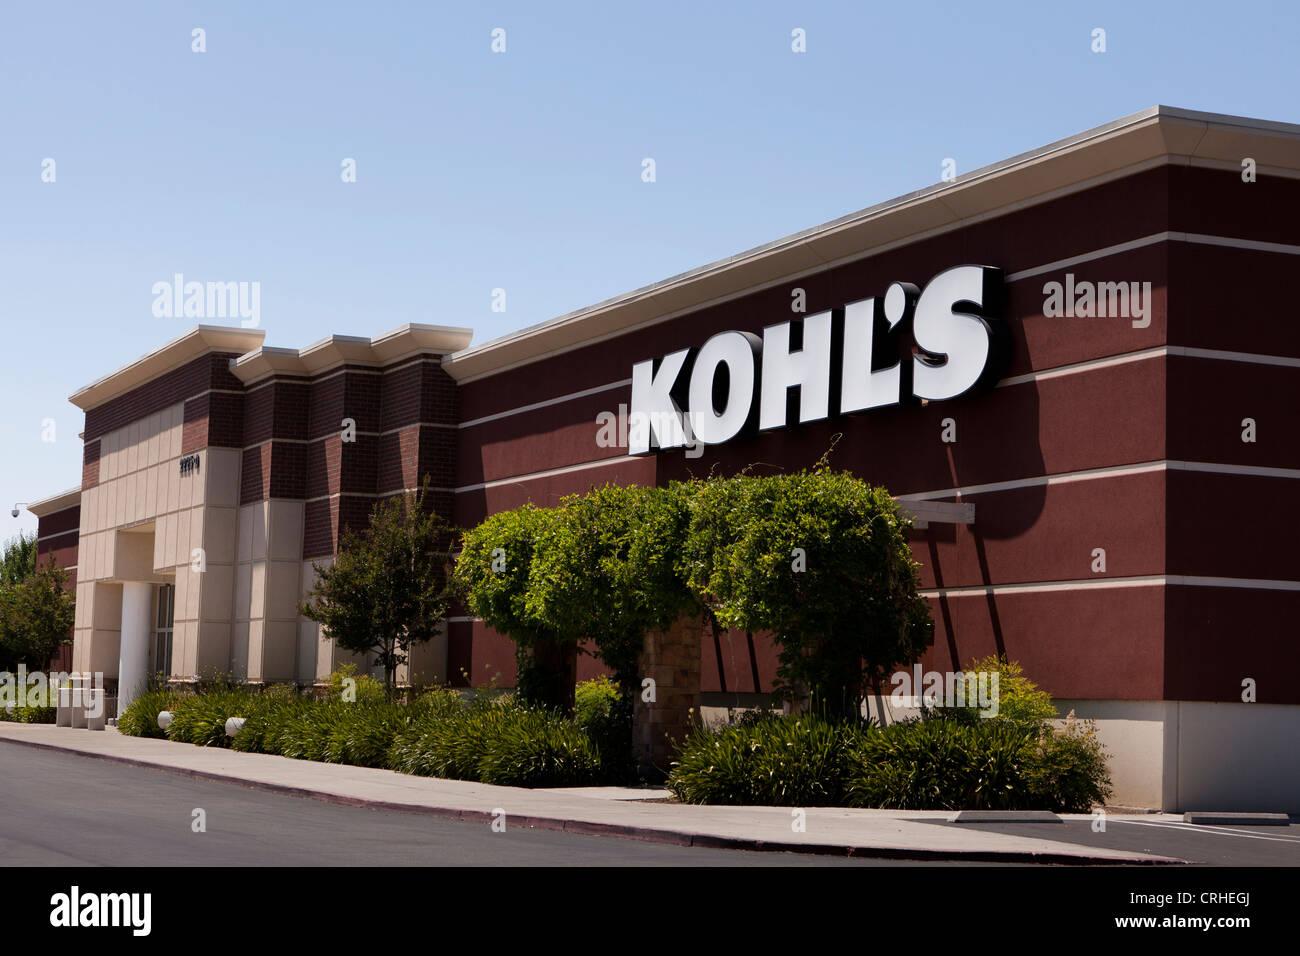 Kohl's department store storefront - California USA - Stock Image